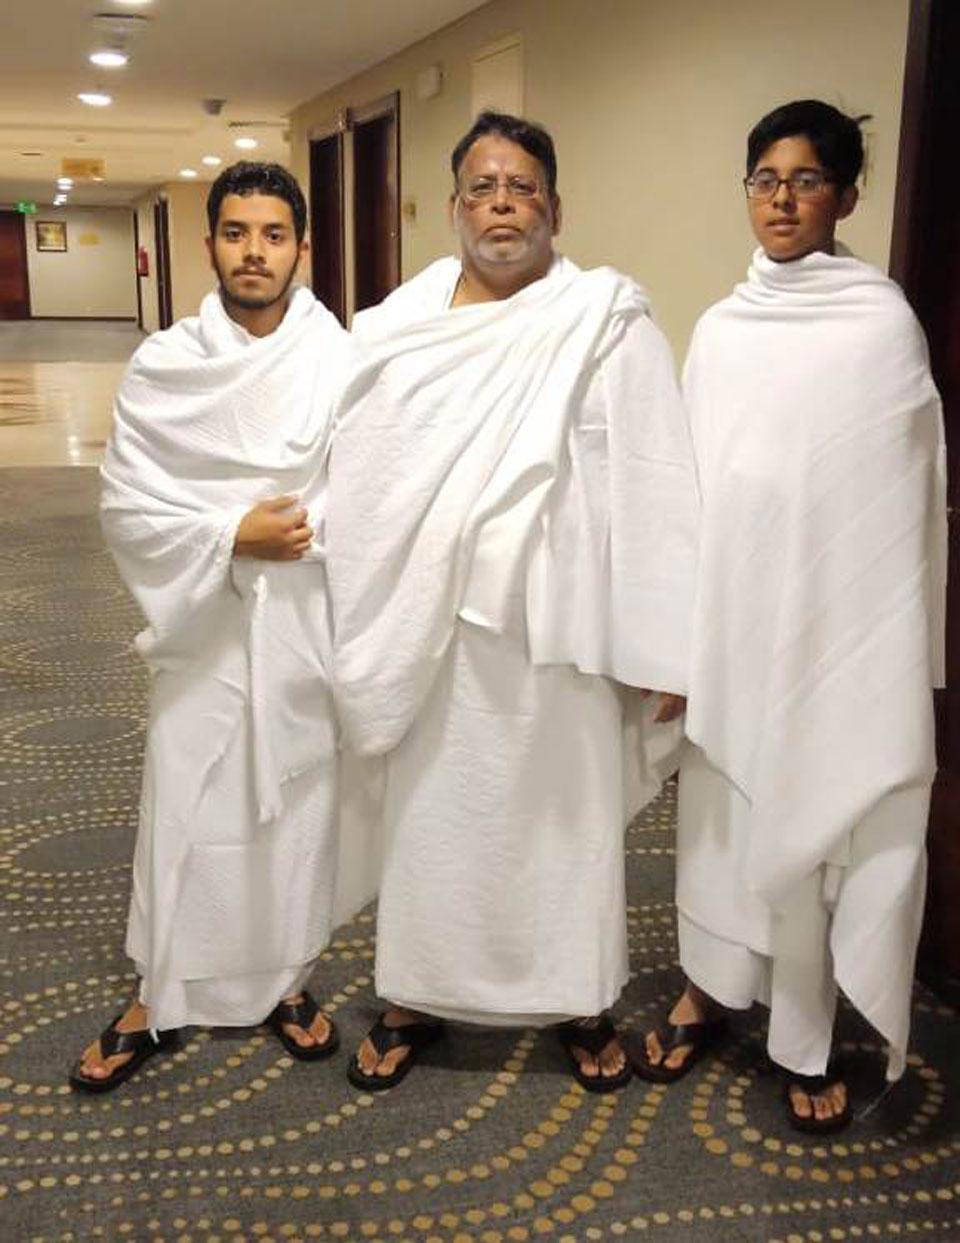 Obaid Ur Rehman, Dr. Ata Ur Rehman and Habib Ur Rehman in Ihram at Meekat